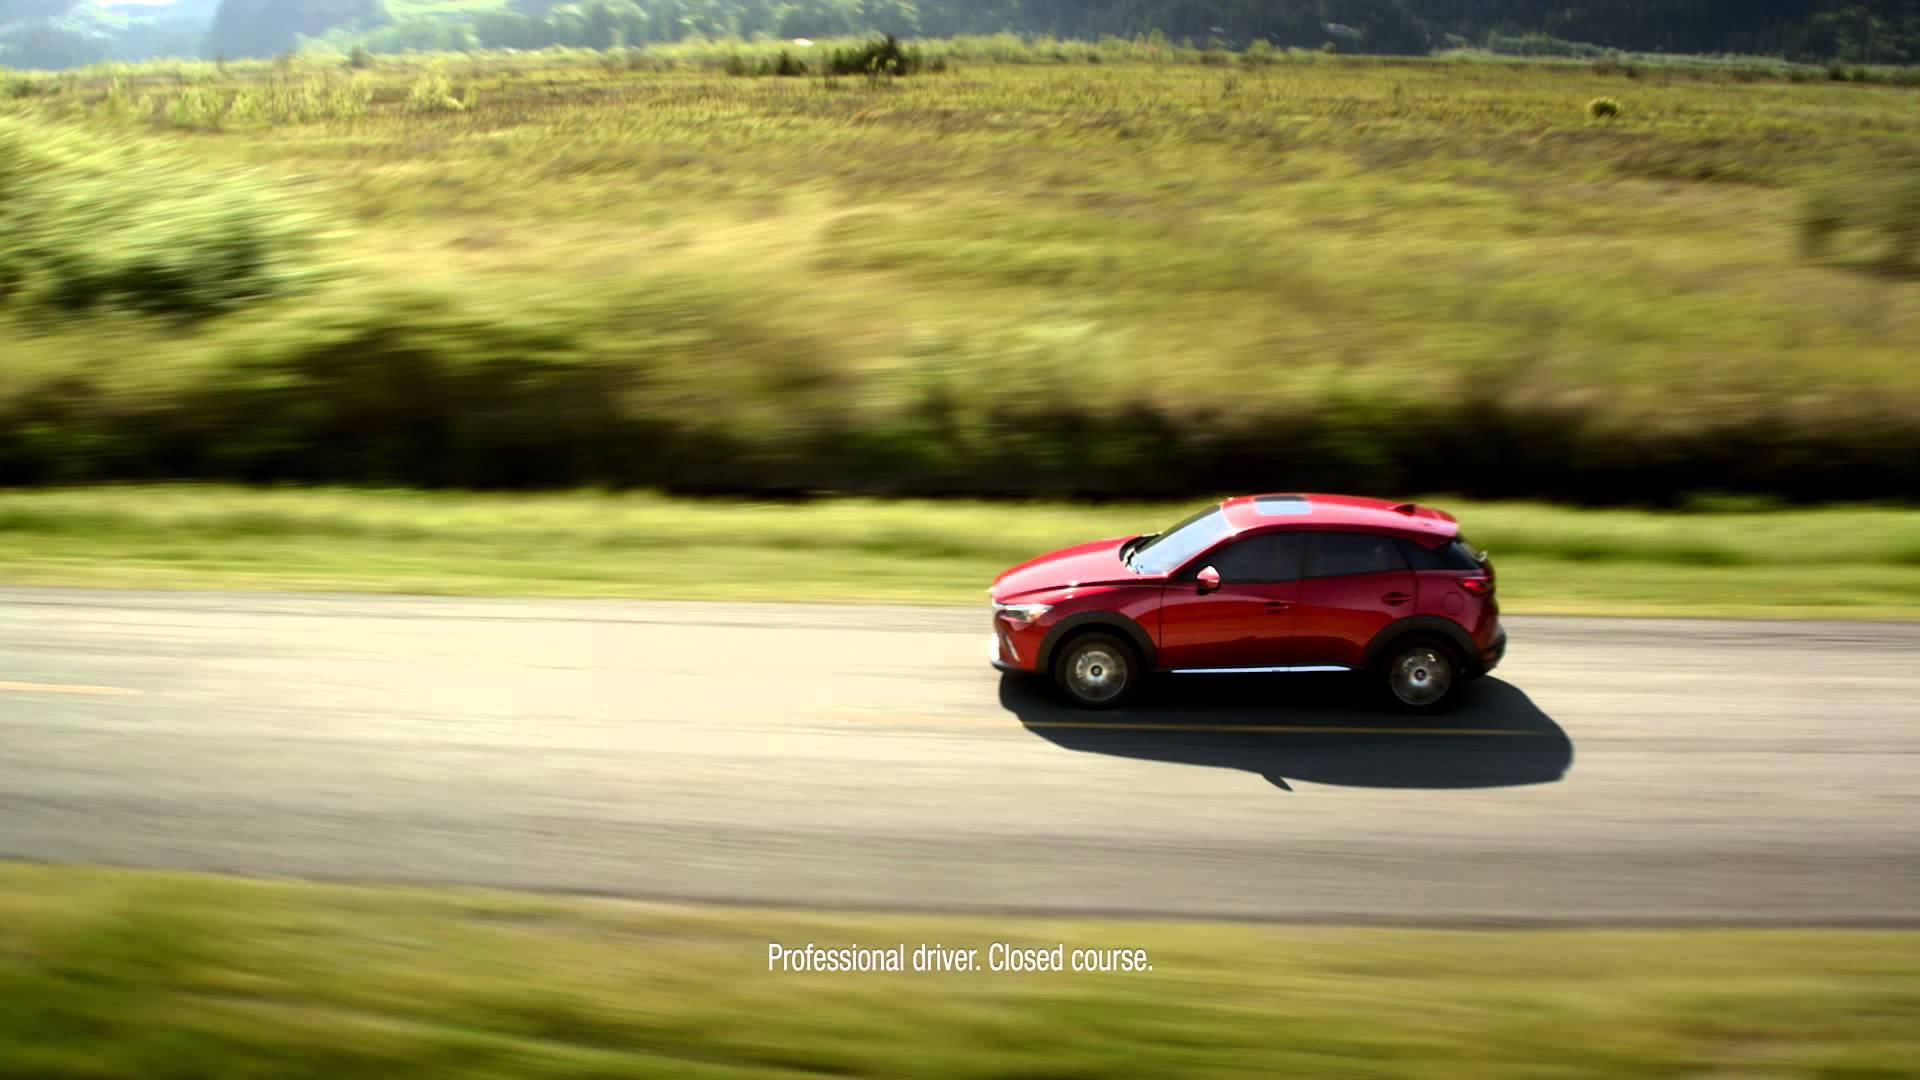 Mazda CX-3 commercial